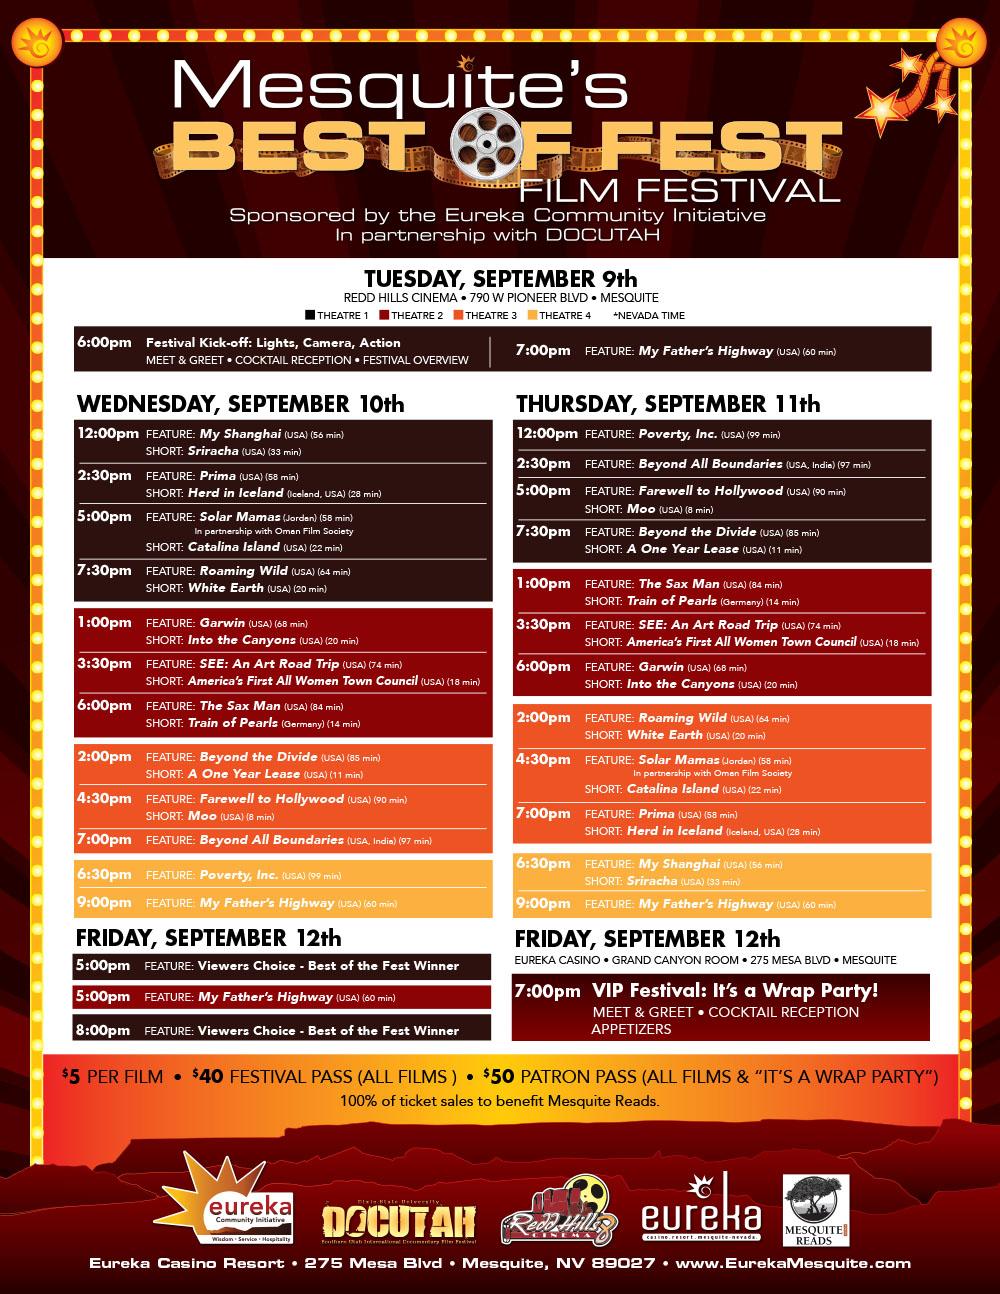 Best of Fest Film Festival starts tonight